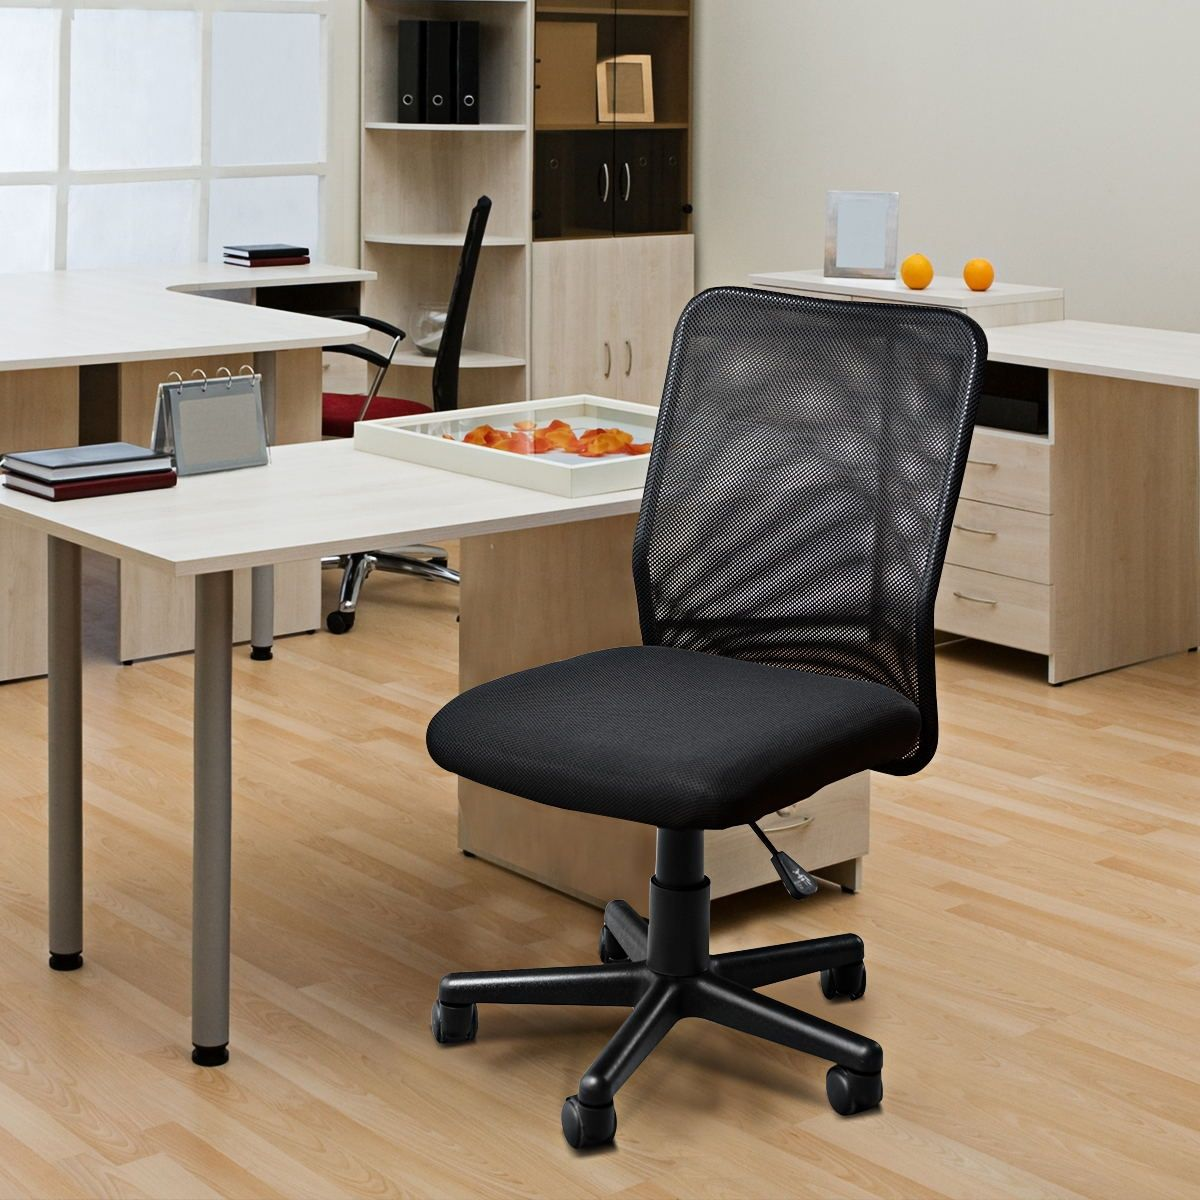 Silla de oficina de malla ergonómica ajustable con respaldo medio